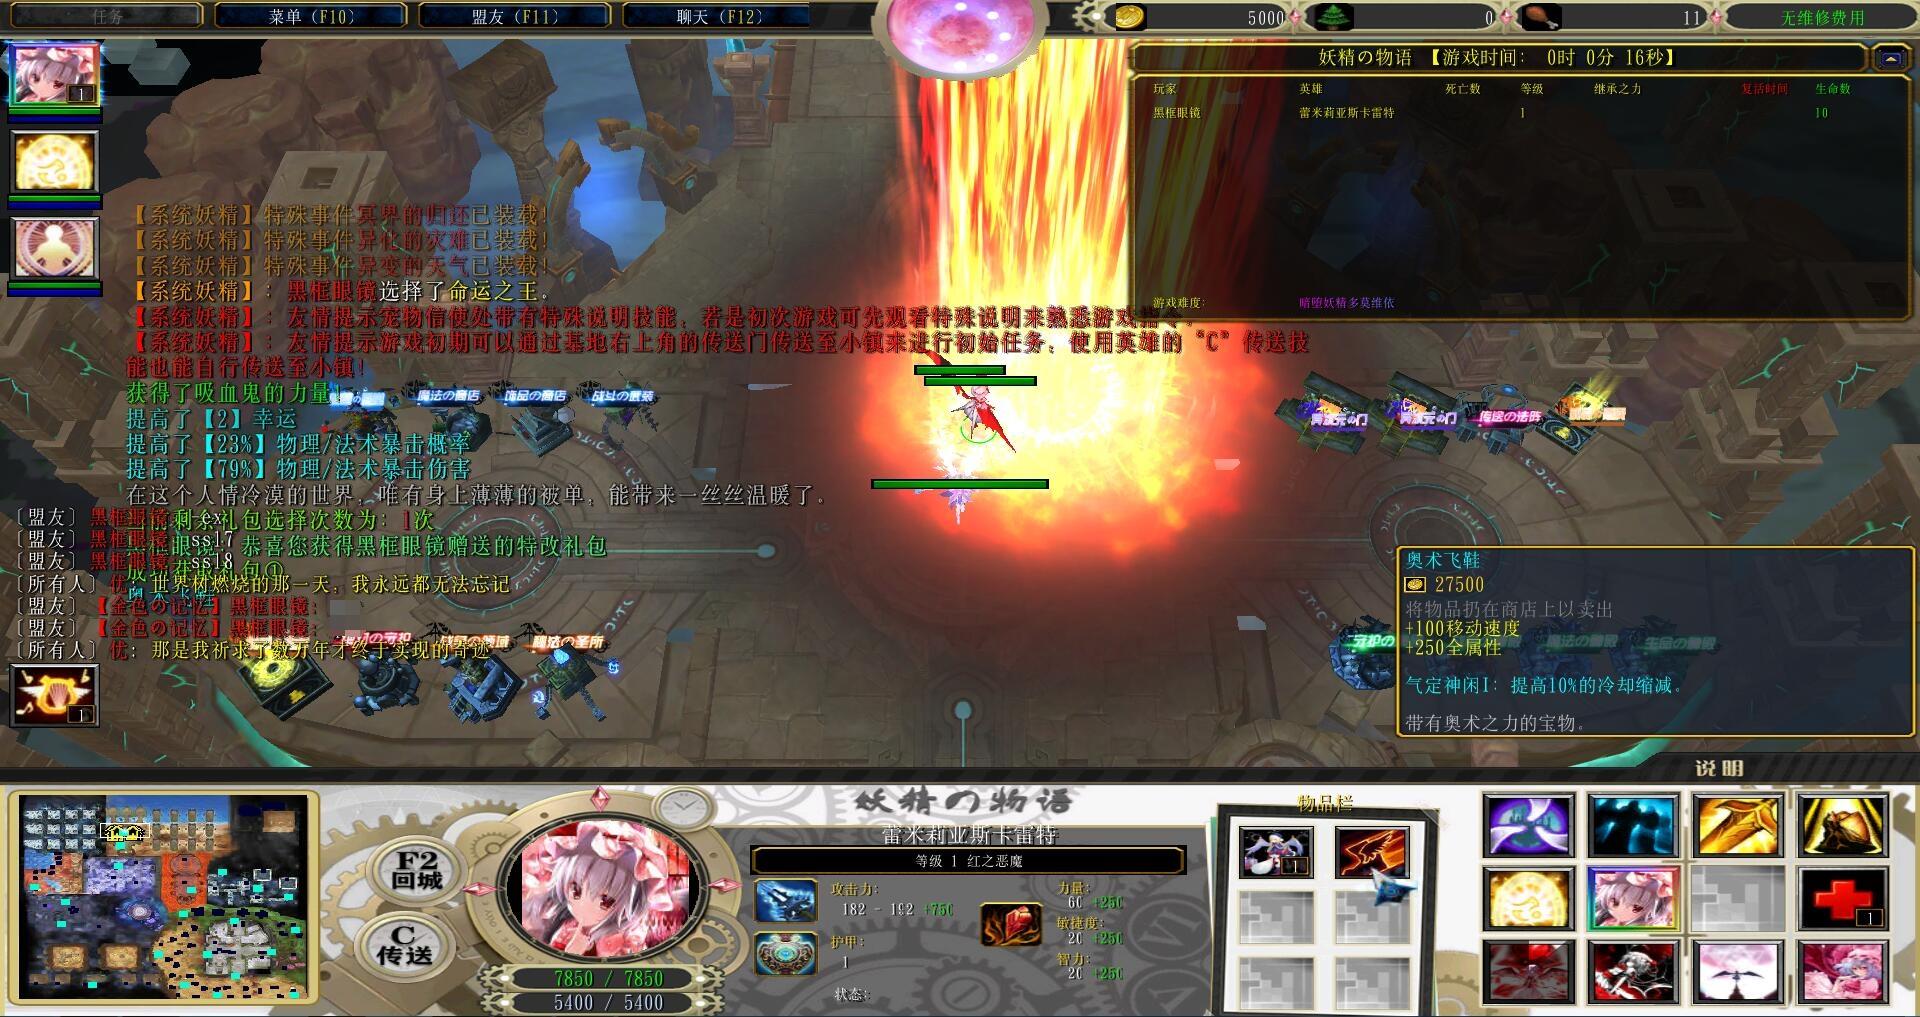 妖精の物语3.03xz1黑式破解